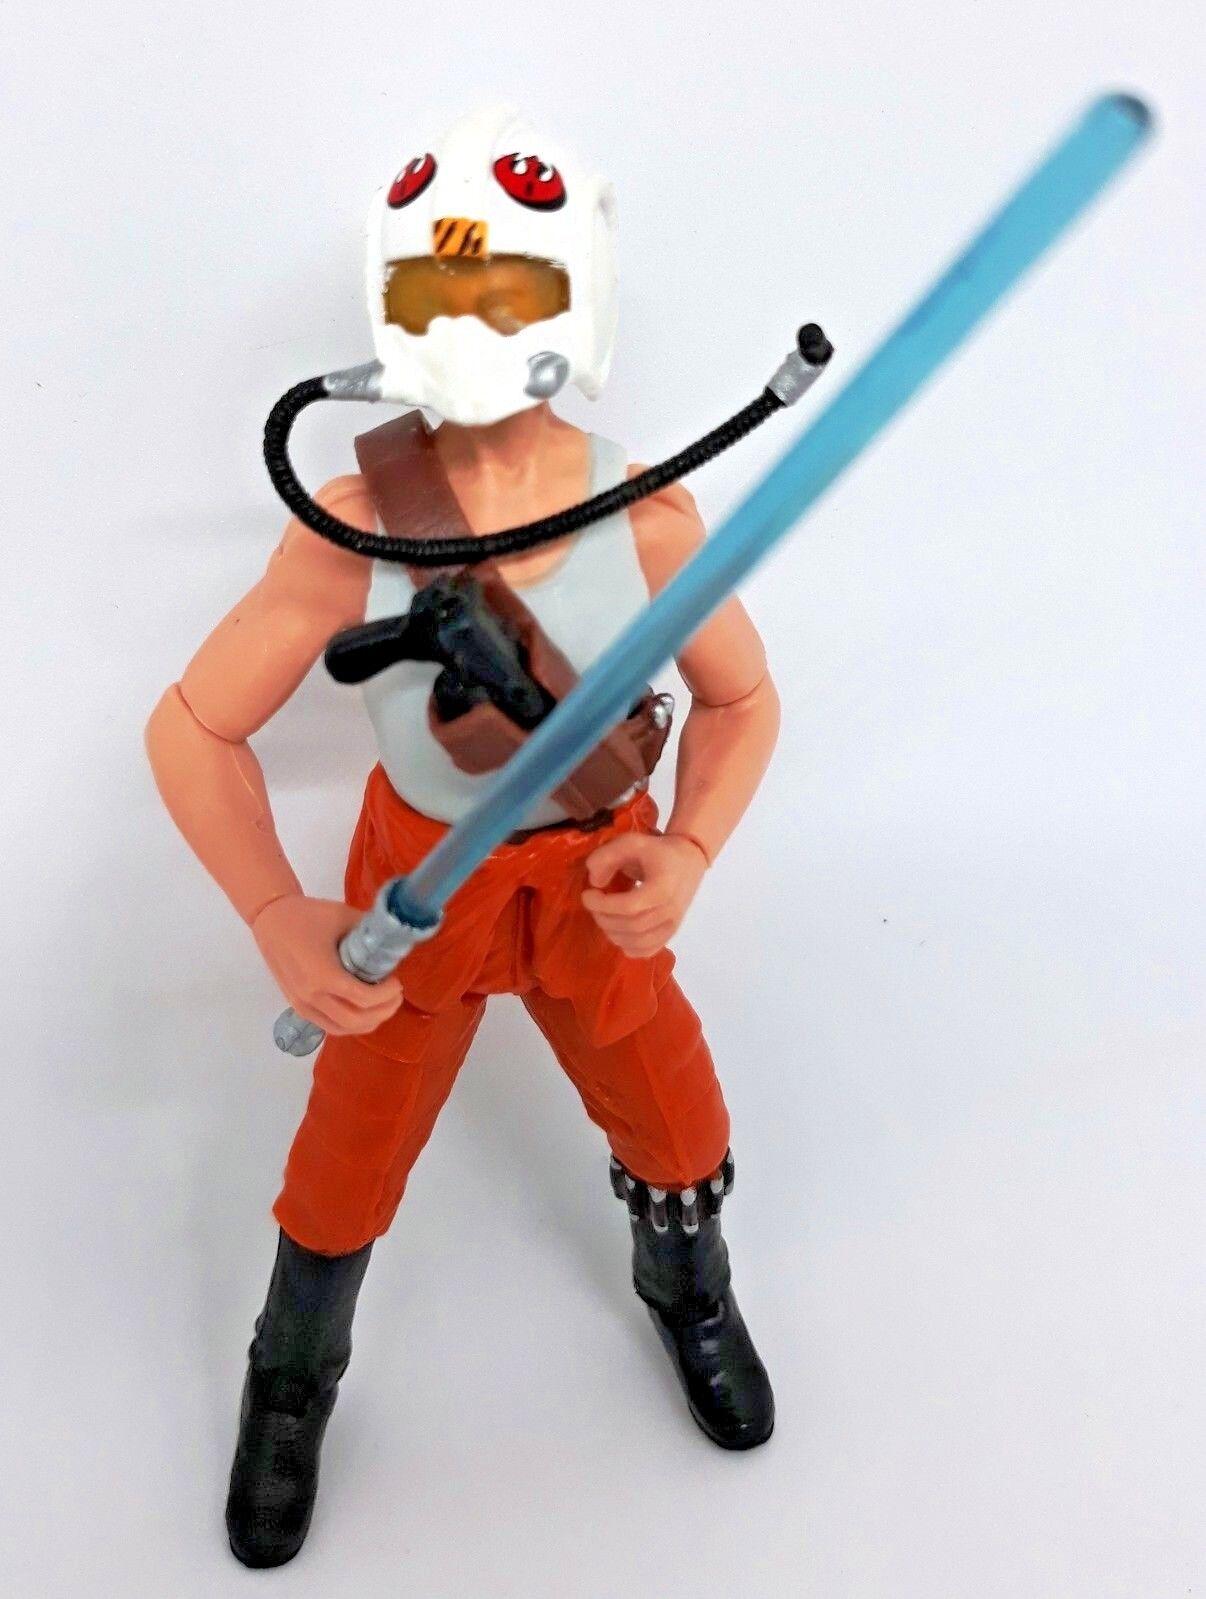 StarWars collection : figurine star wars hasbro 2007 n°2